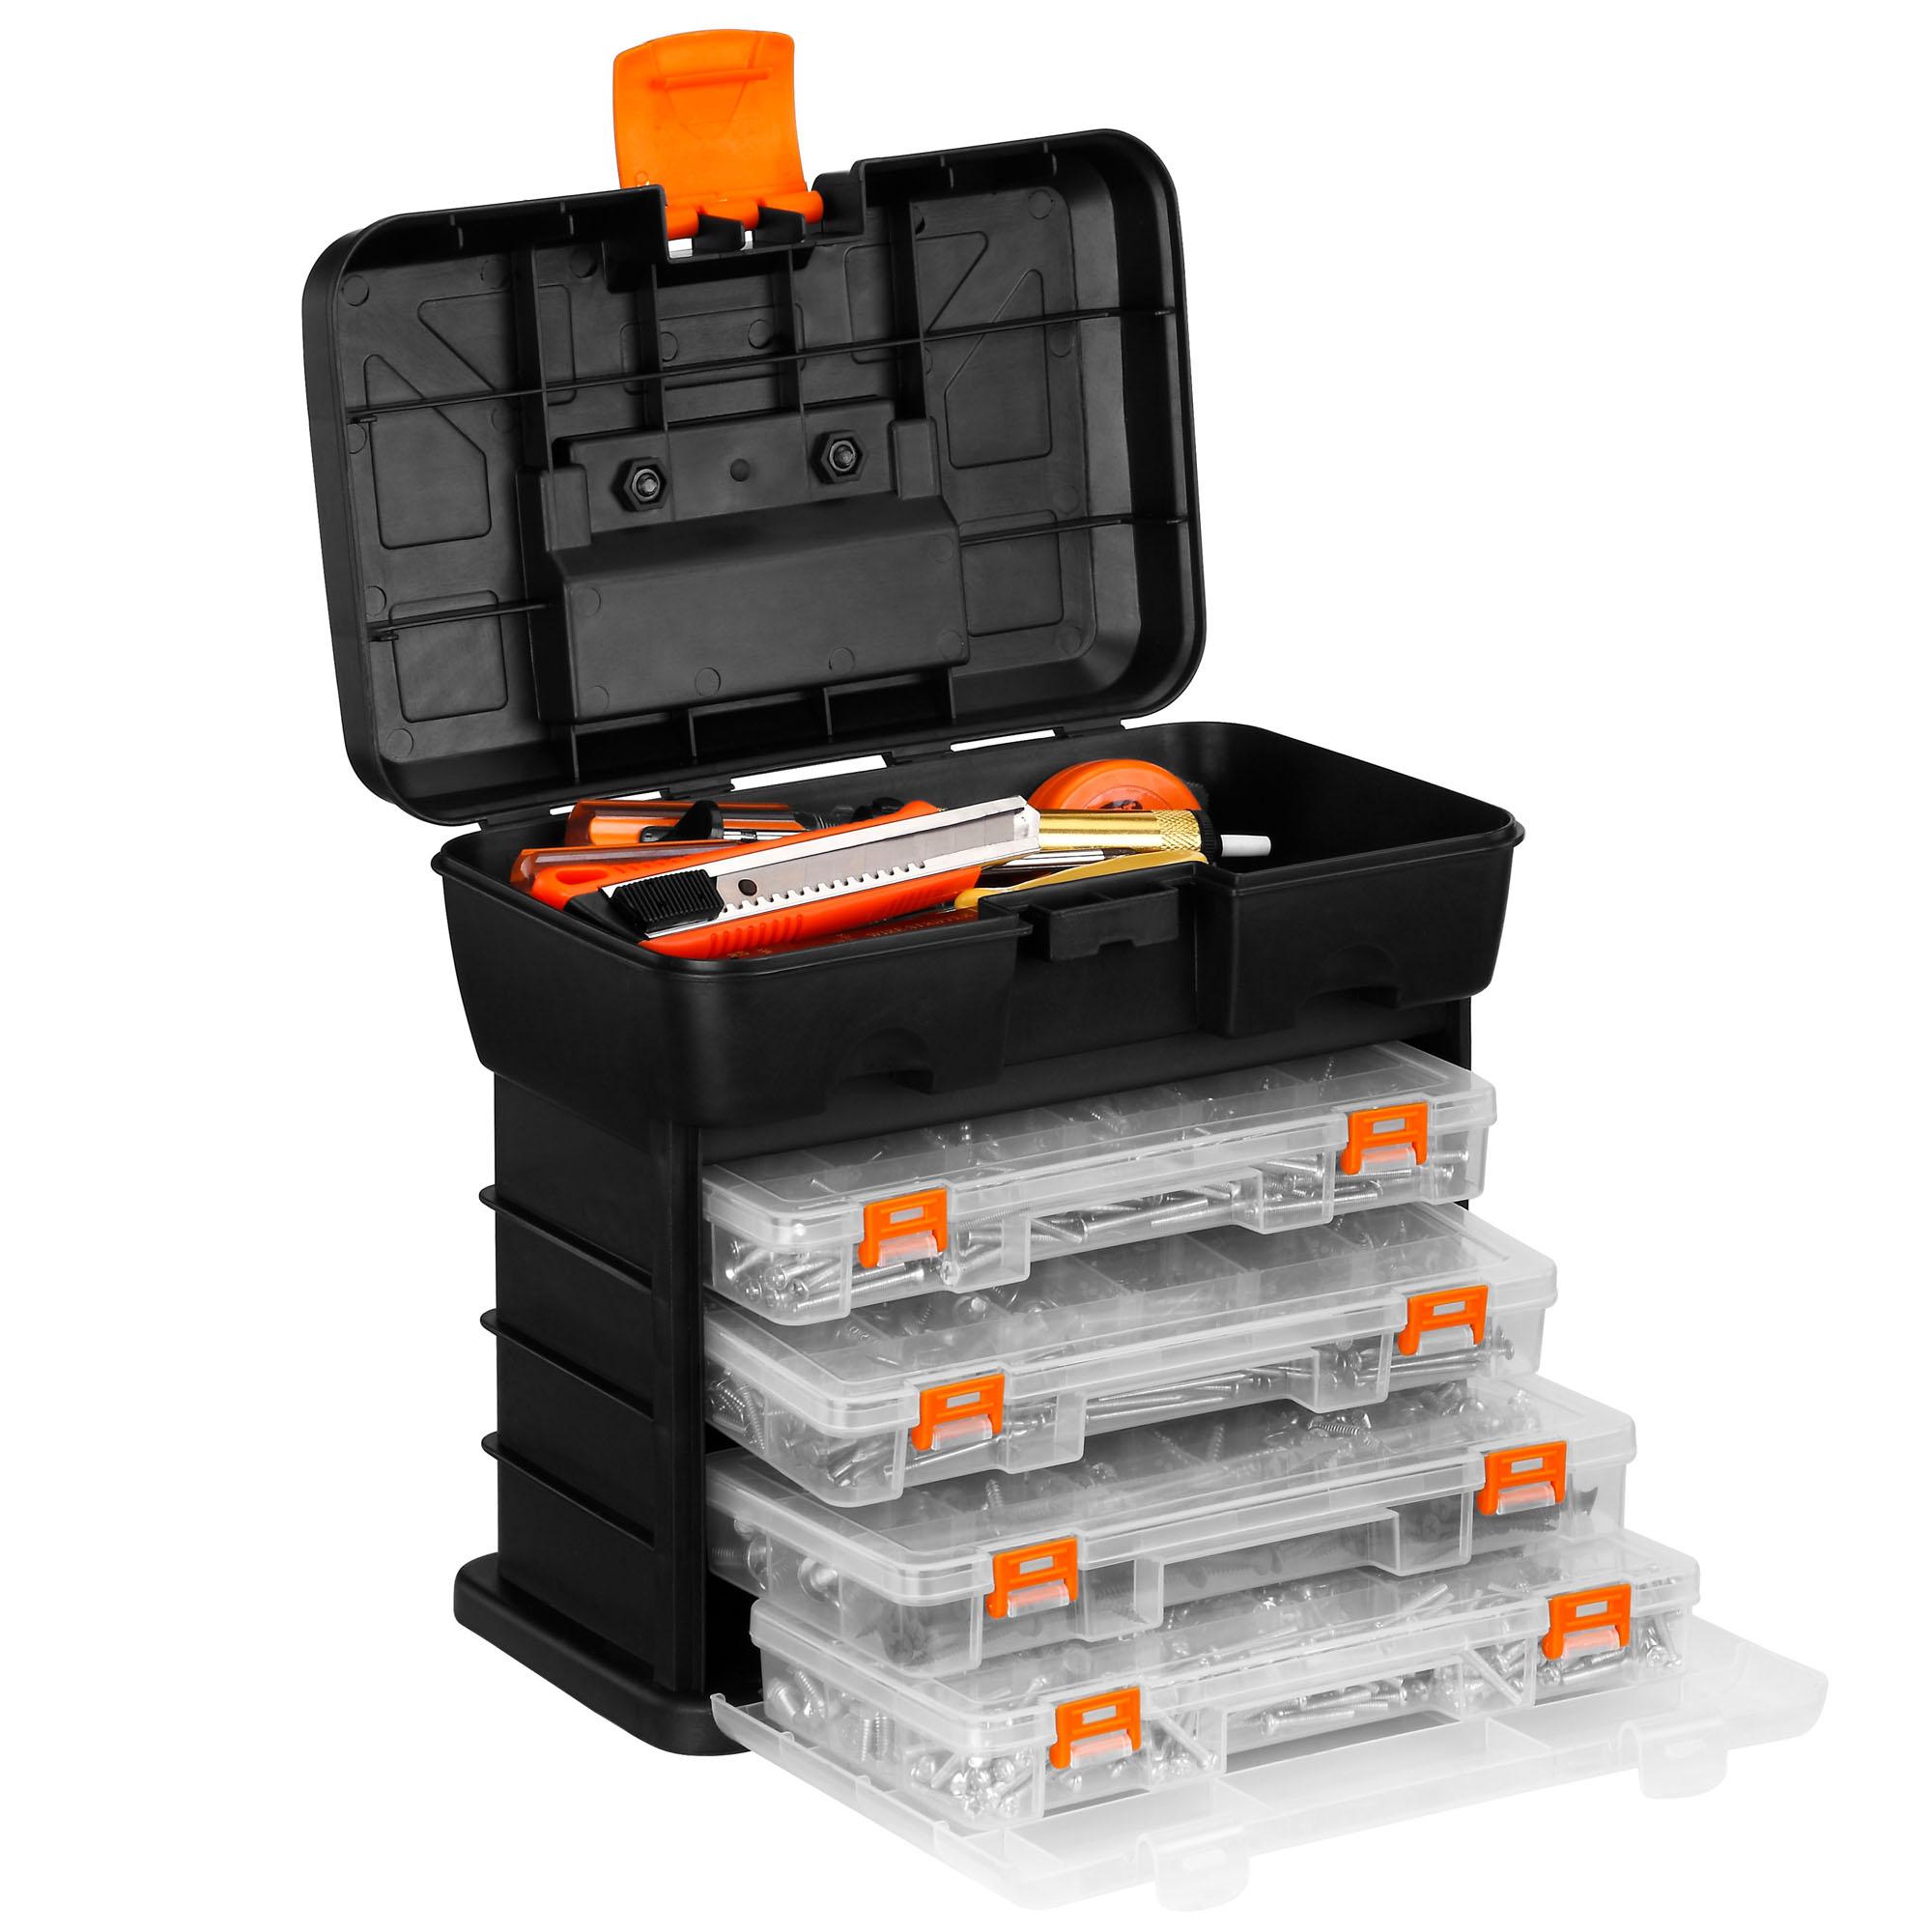 Vonhaus Utility Diy Storage Tool Box Carry Case 4